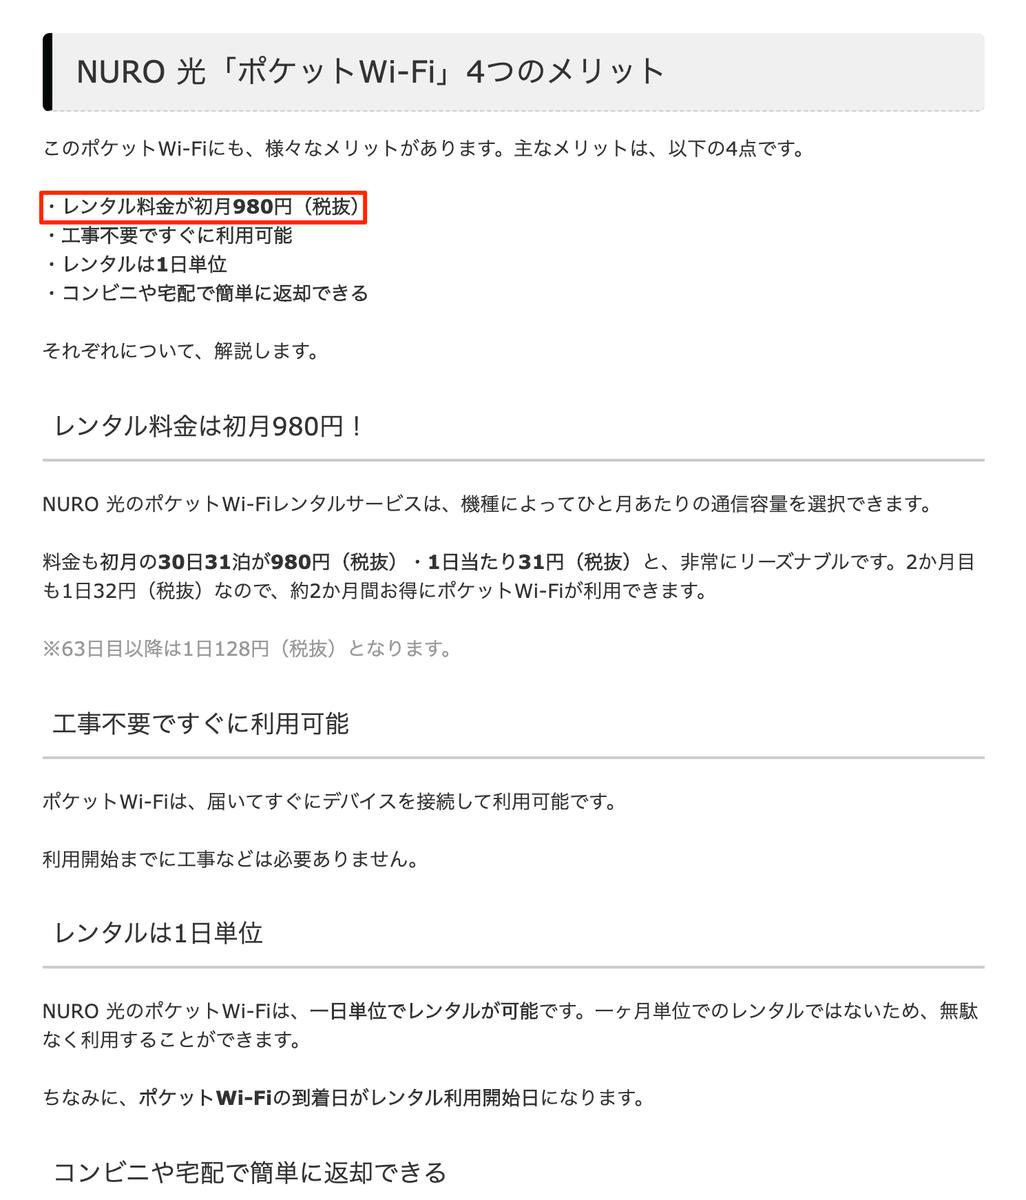 f:id:YusukeIwaki:20200526230333p:plain